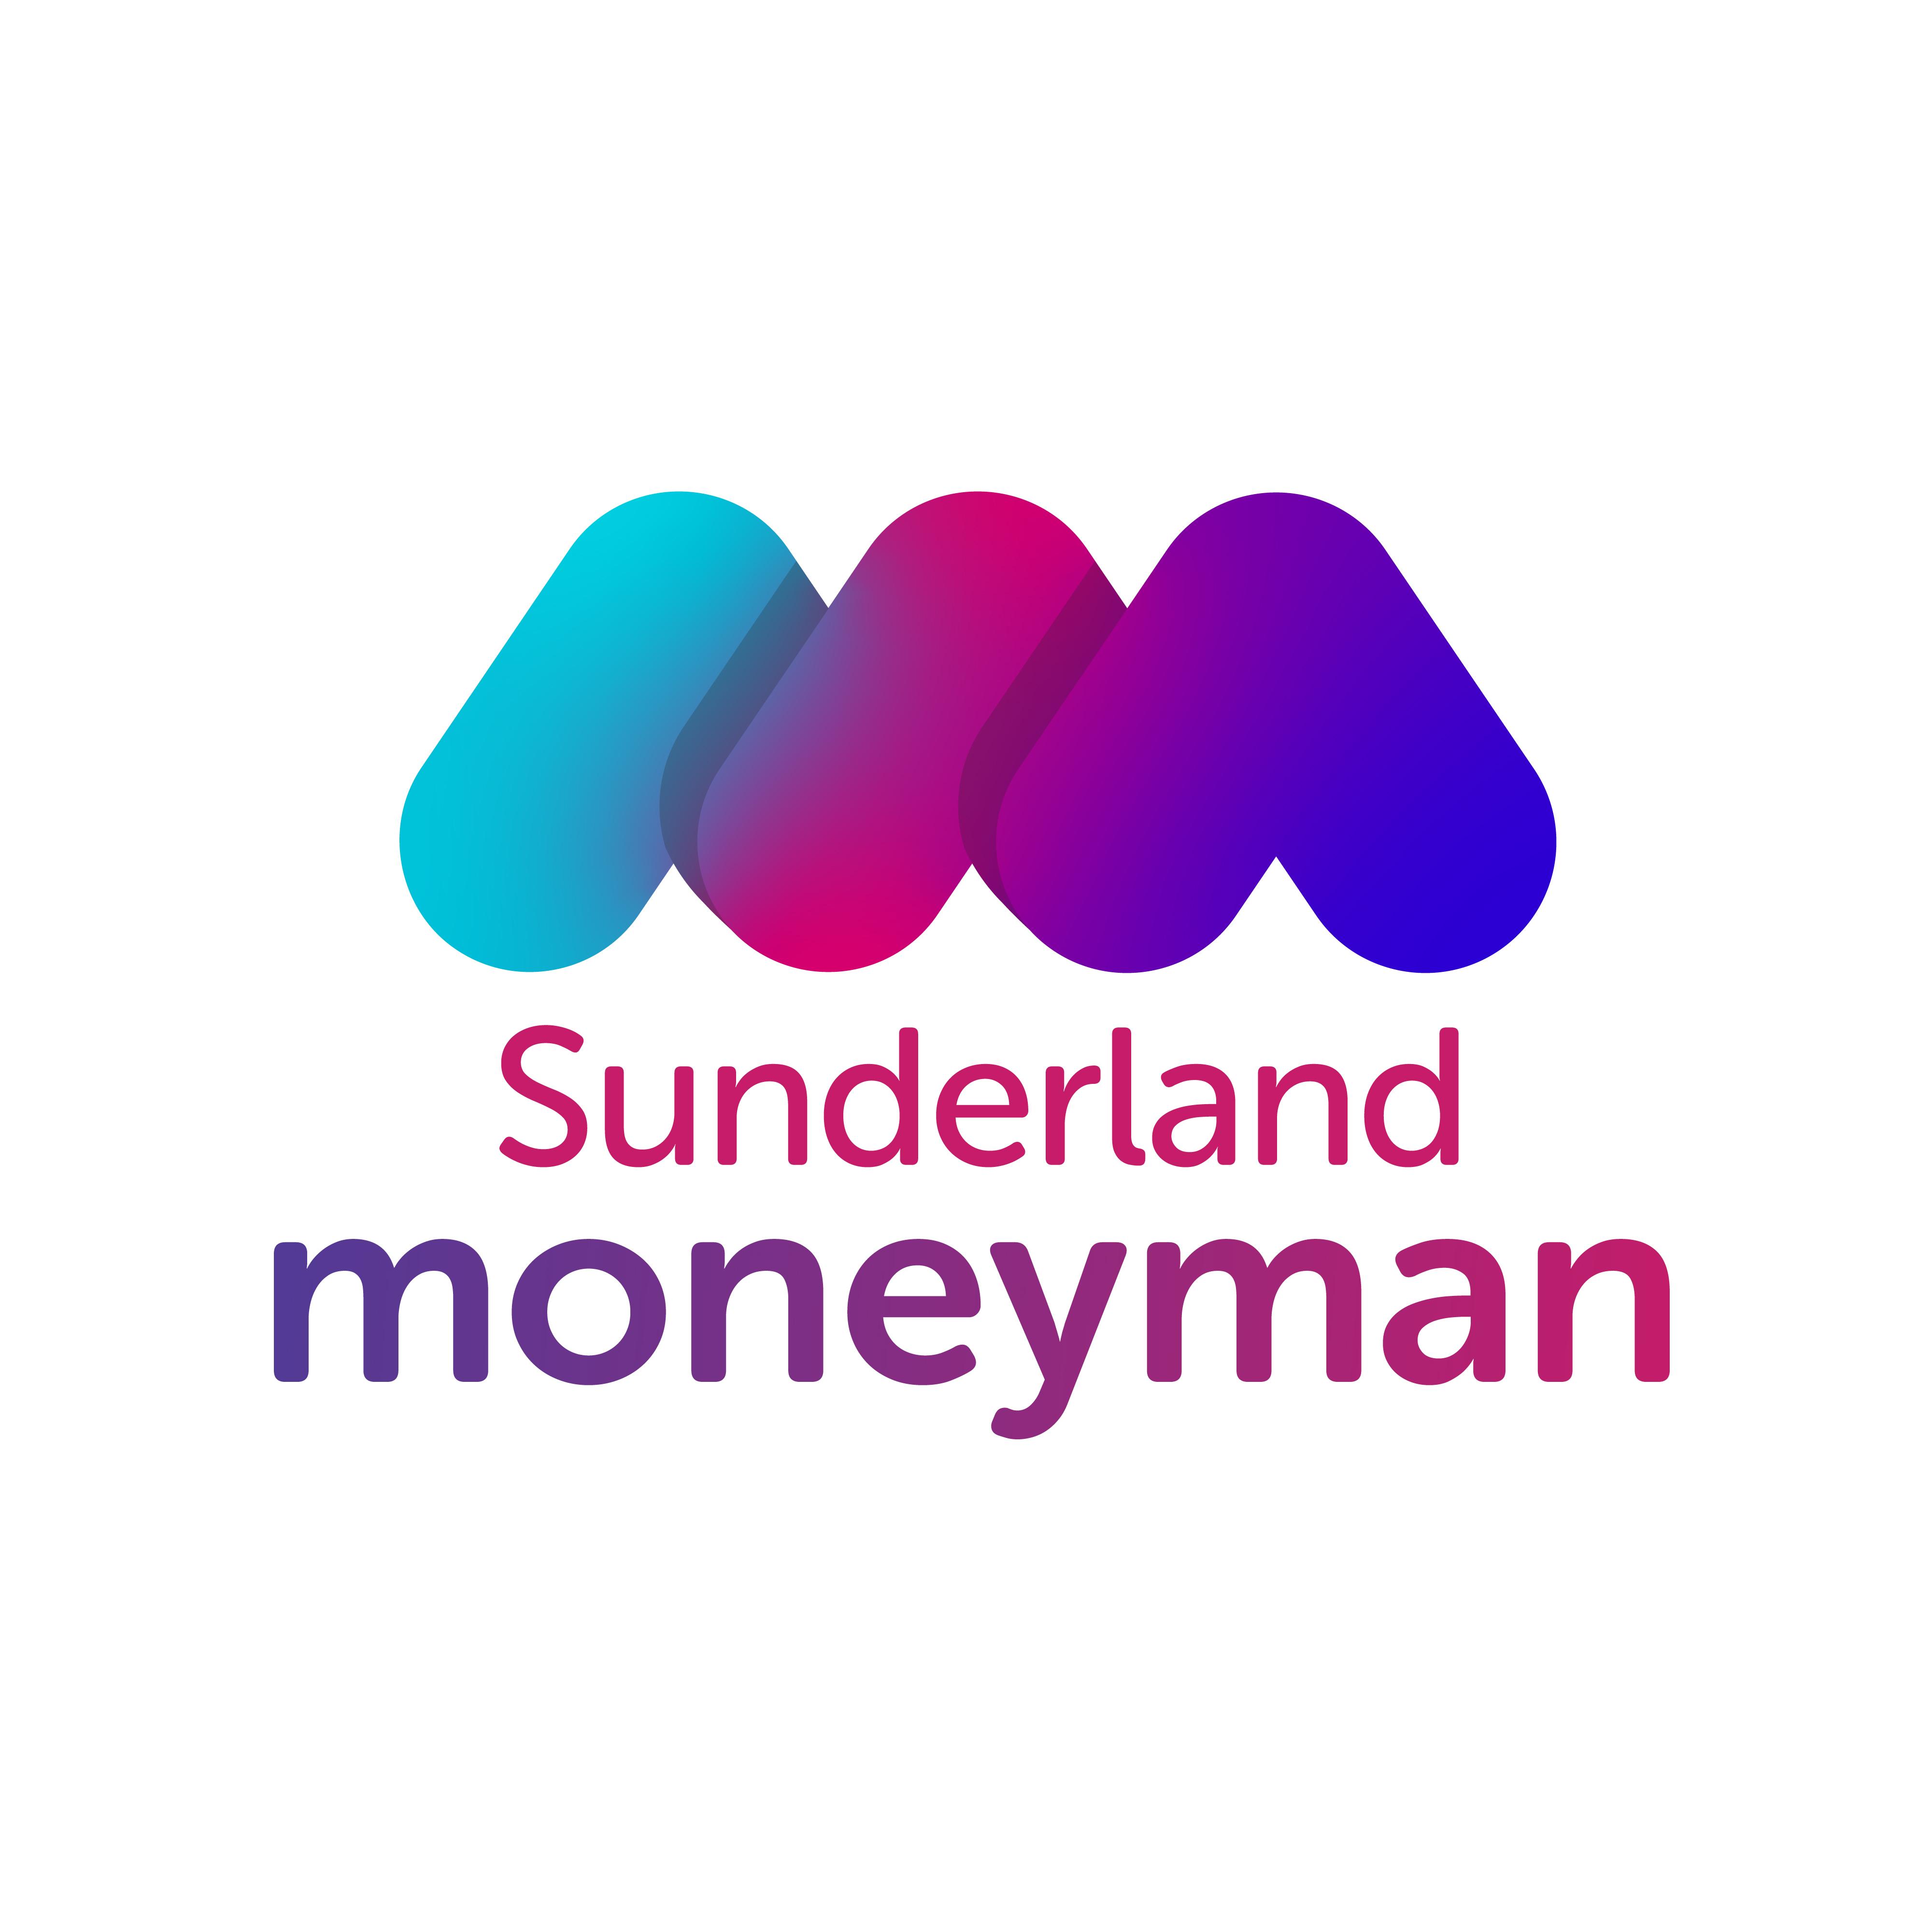 Read Sunderlandmoneyman – Mortgage Broker Reviews